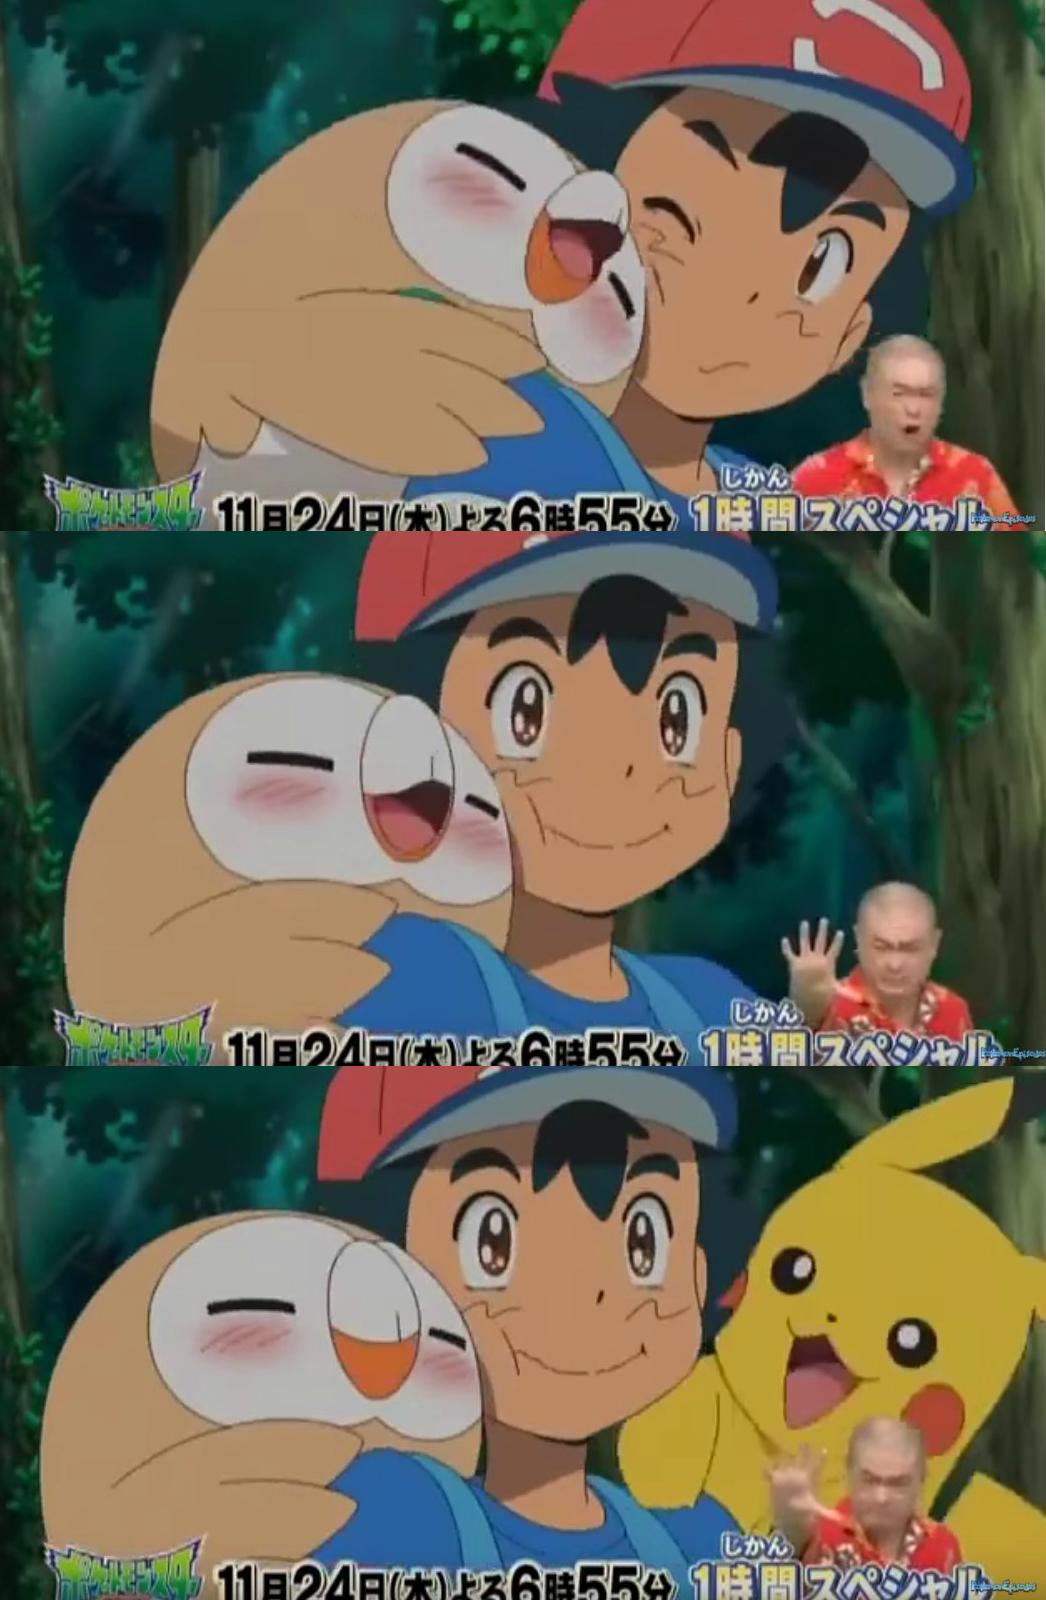 E8 82 A25  E3 81 97 E3 81 8c E3 82 93 Pokemon Sun And Moon Ash Ketchum Pokemon X And Y Pikachu